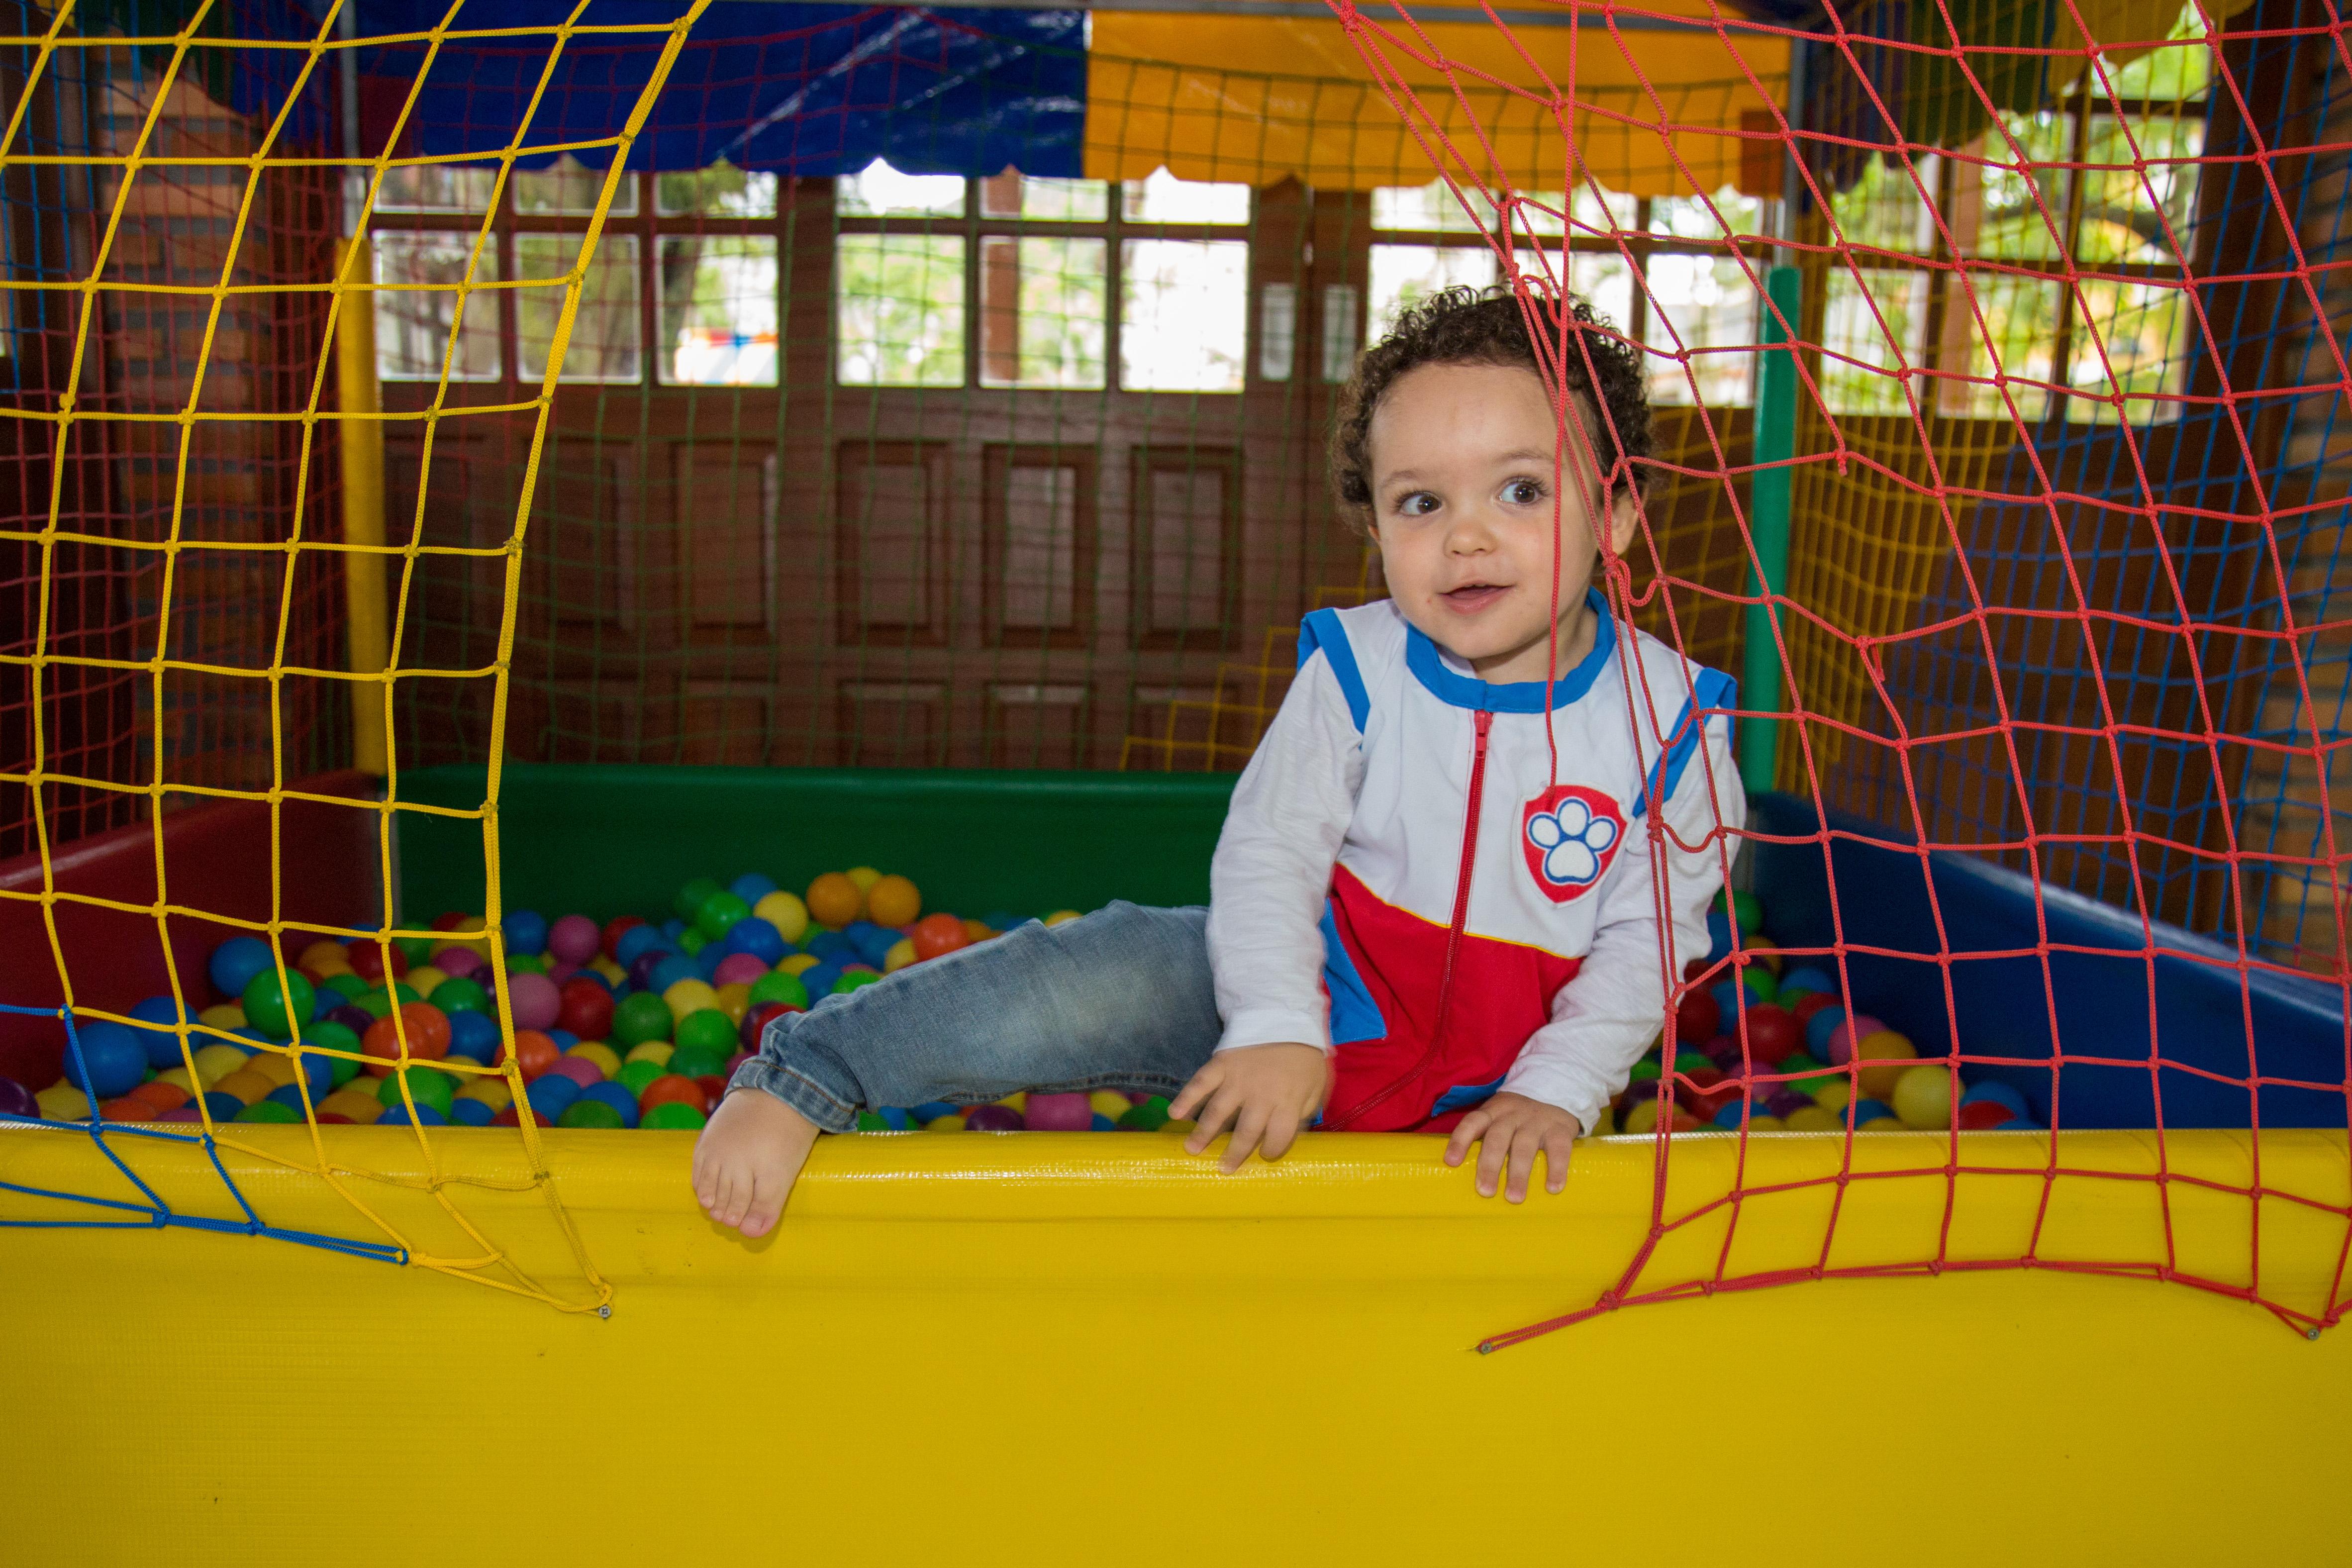 Festa‐Infantil‐Florianopolis‐Ana‐Marmo‐FotografiaFesta‐Infantil‐Florianopolis‐Ana‐Marmo‐Fotografia191A0544